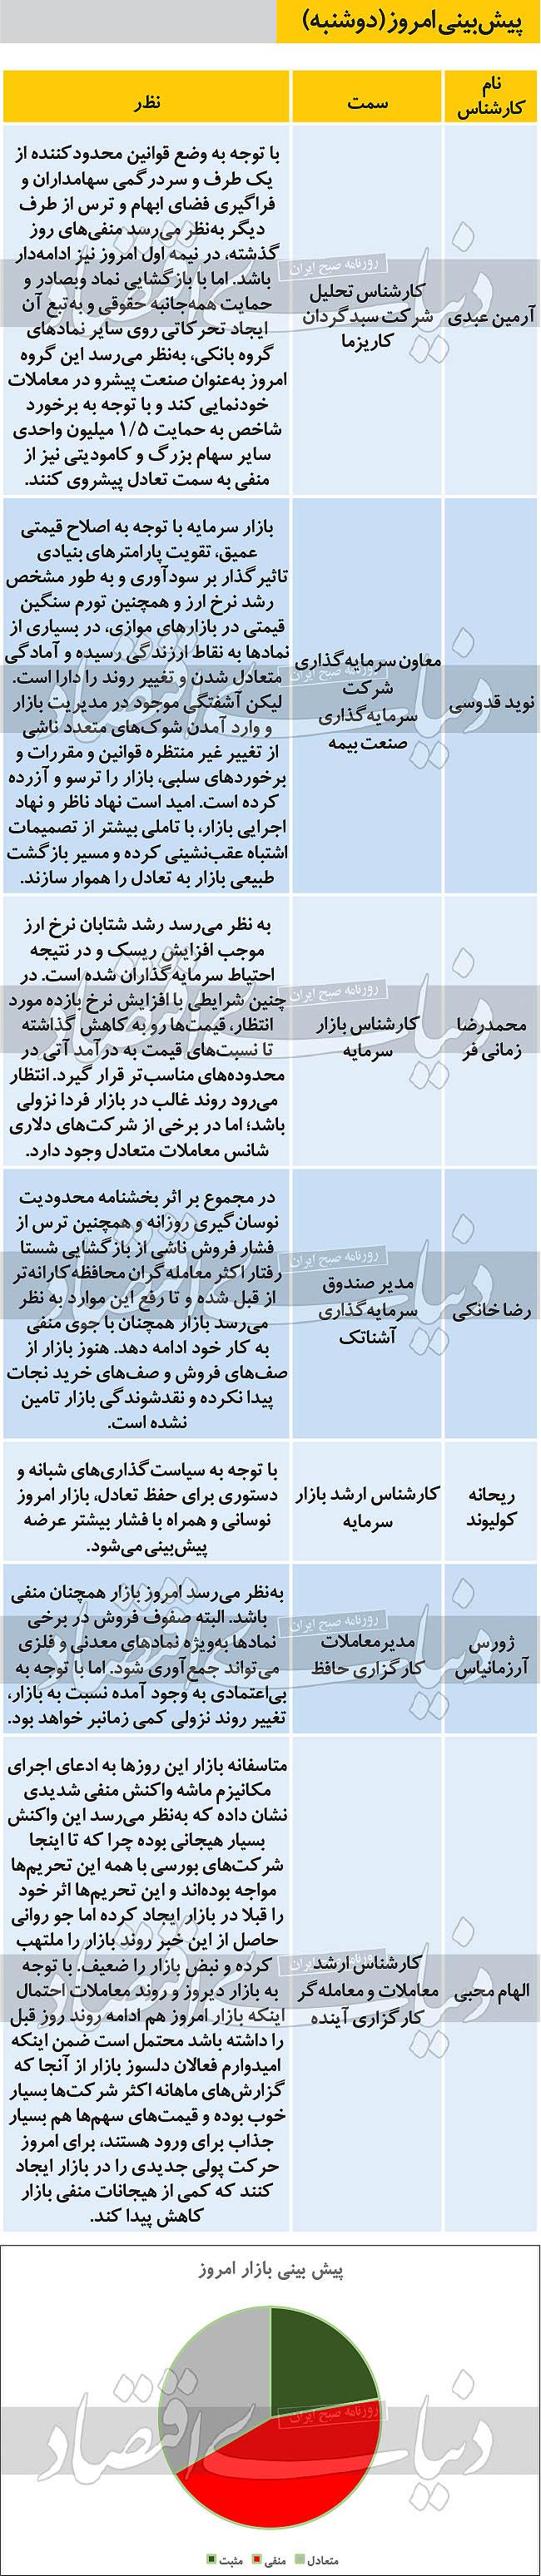 پیشبینی بورس 7 مهر 99